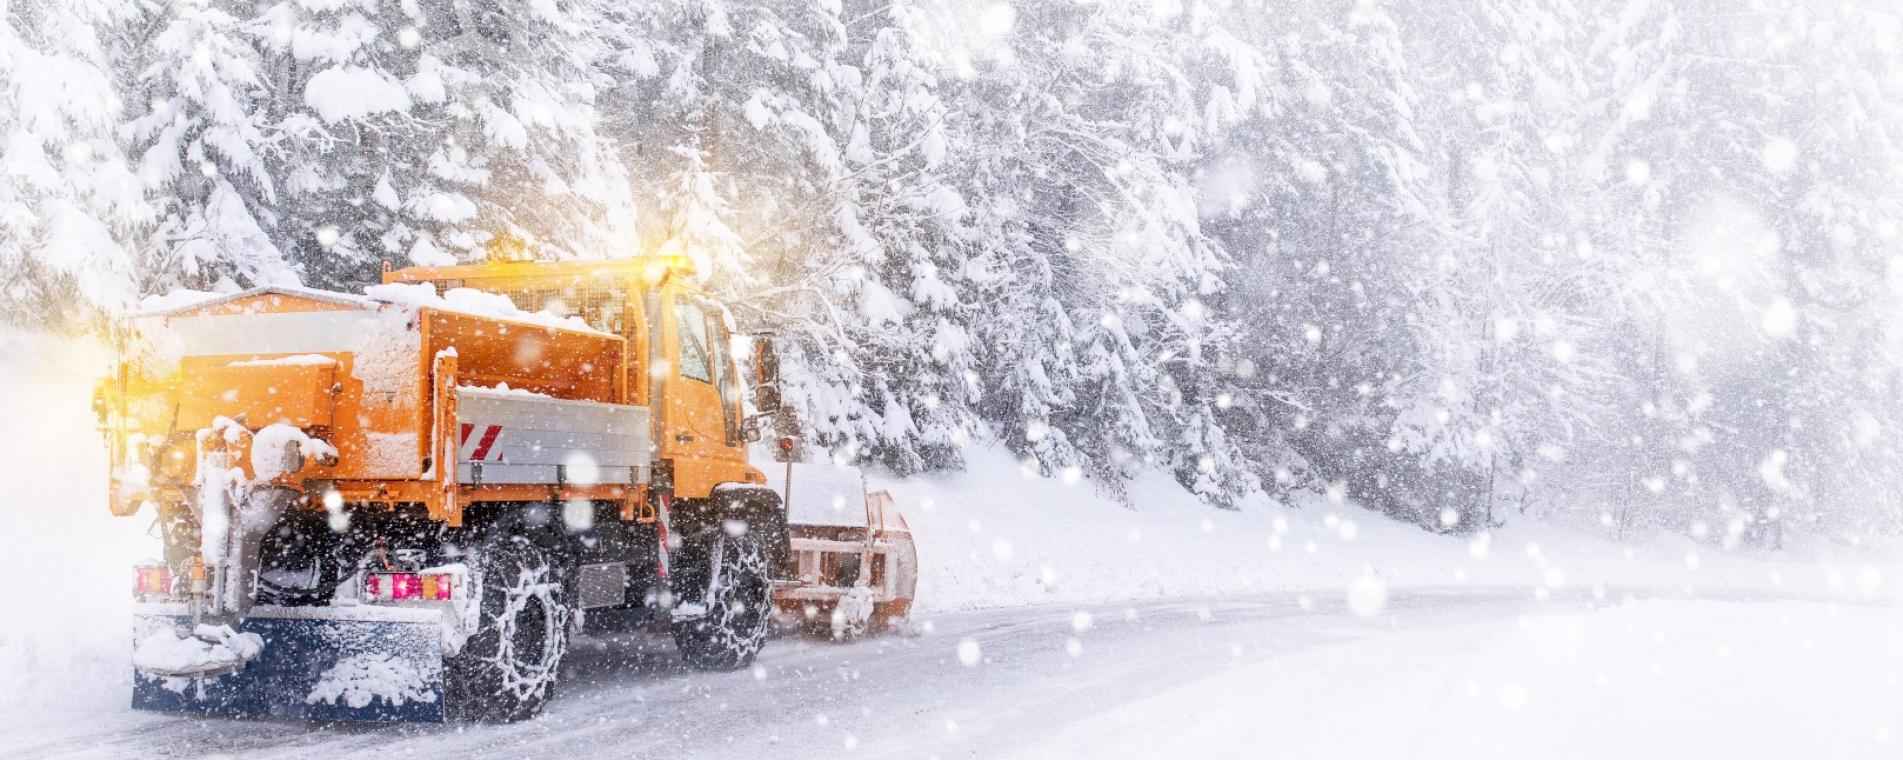 Kar ve Buz Çözüsü Solüsyon